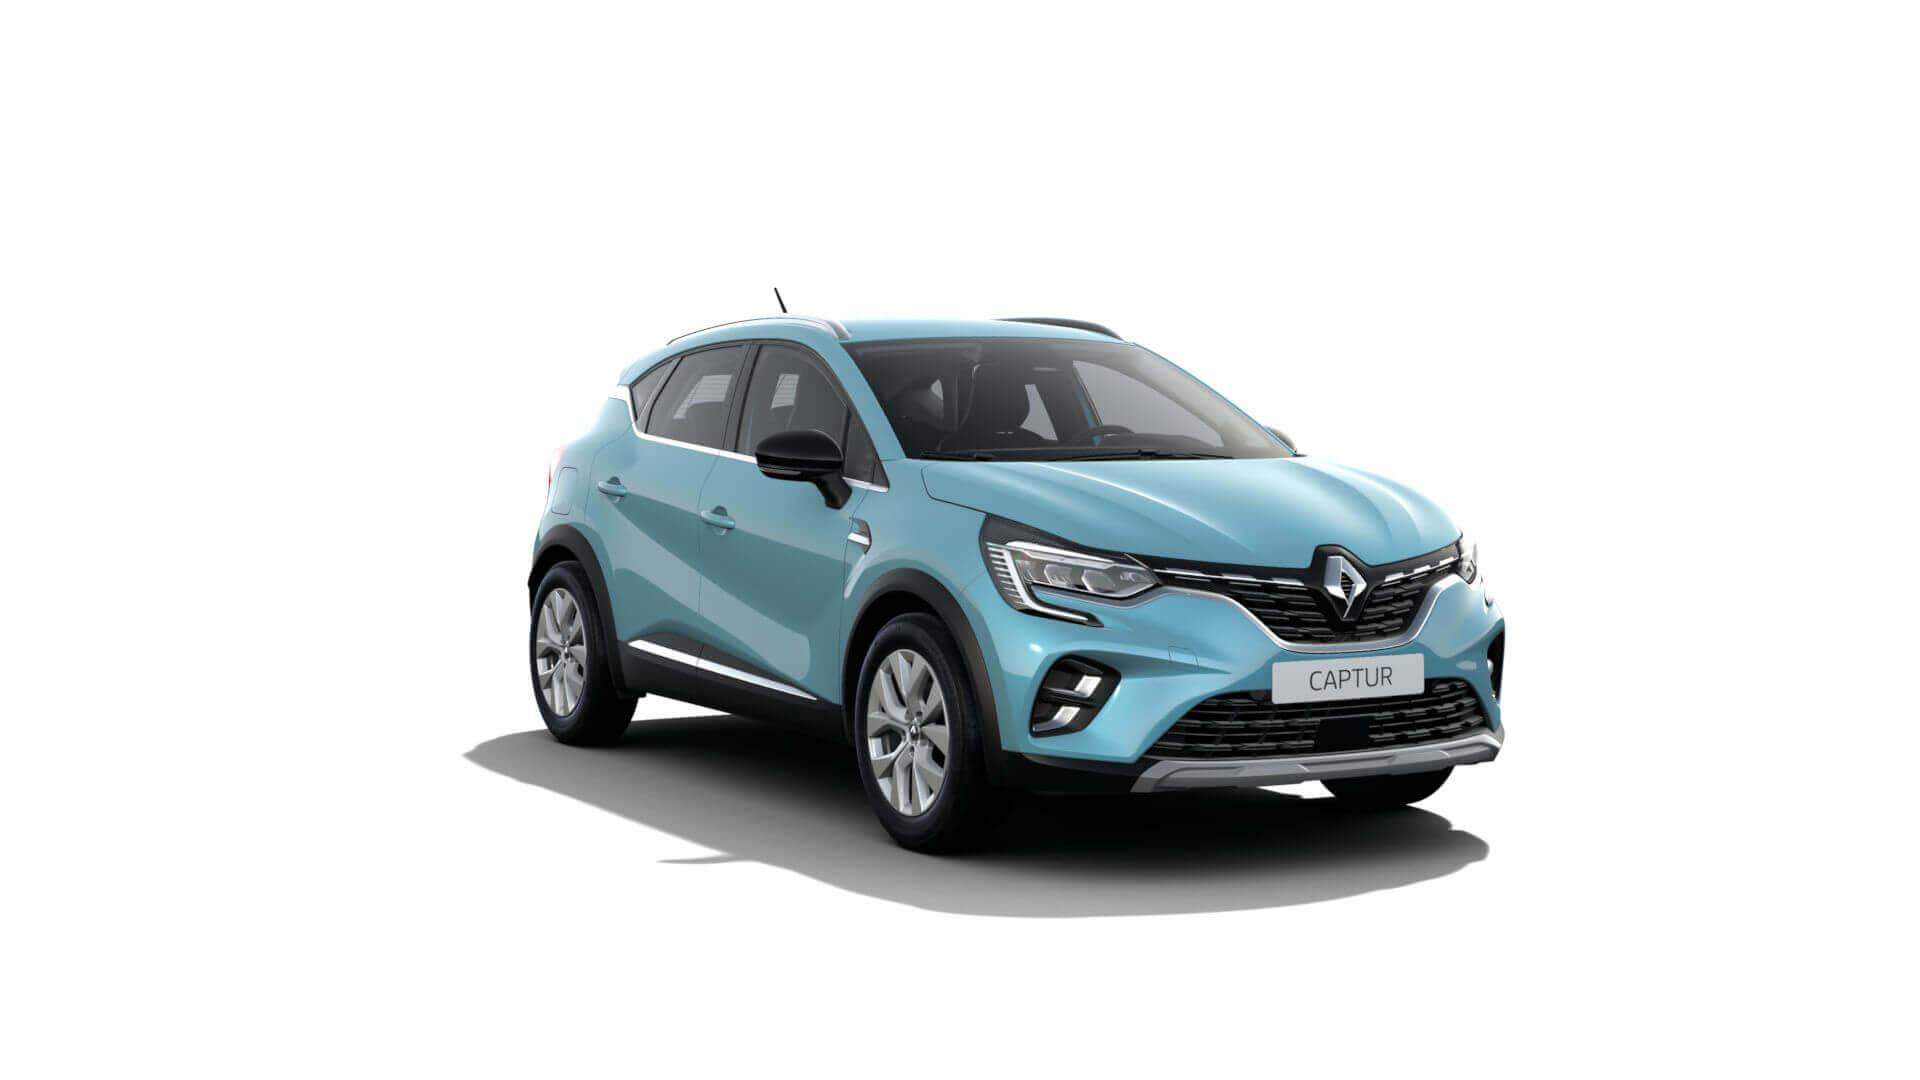 Automodell türkis - Renault Captur - Renault Ahrens Hannover